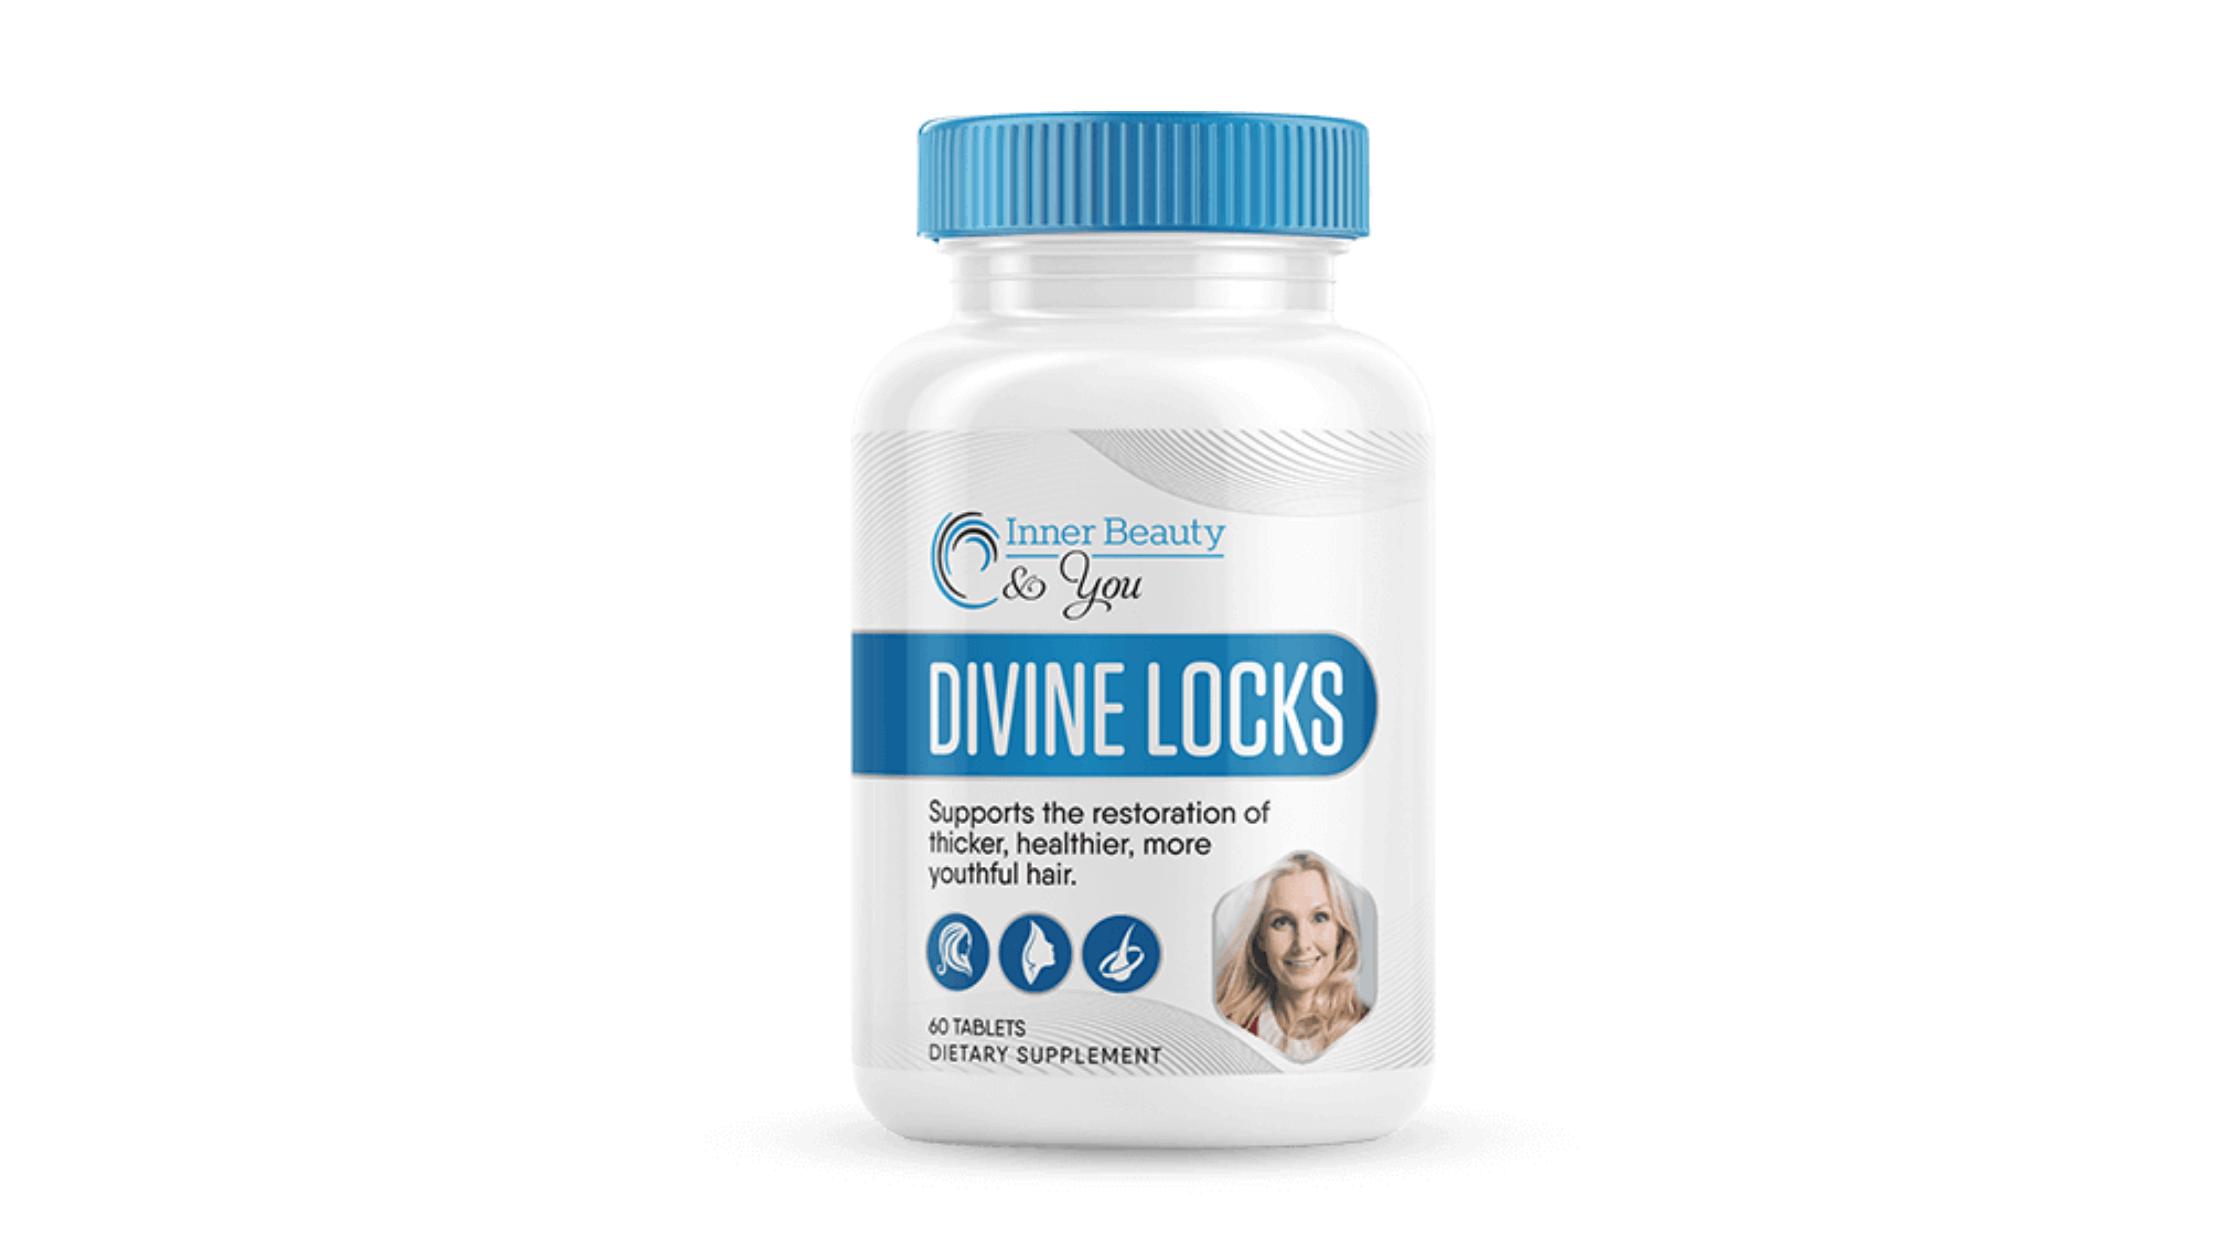 Divine Locks Reviews